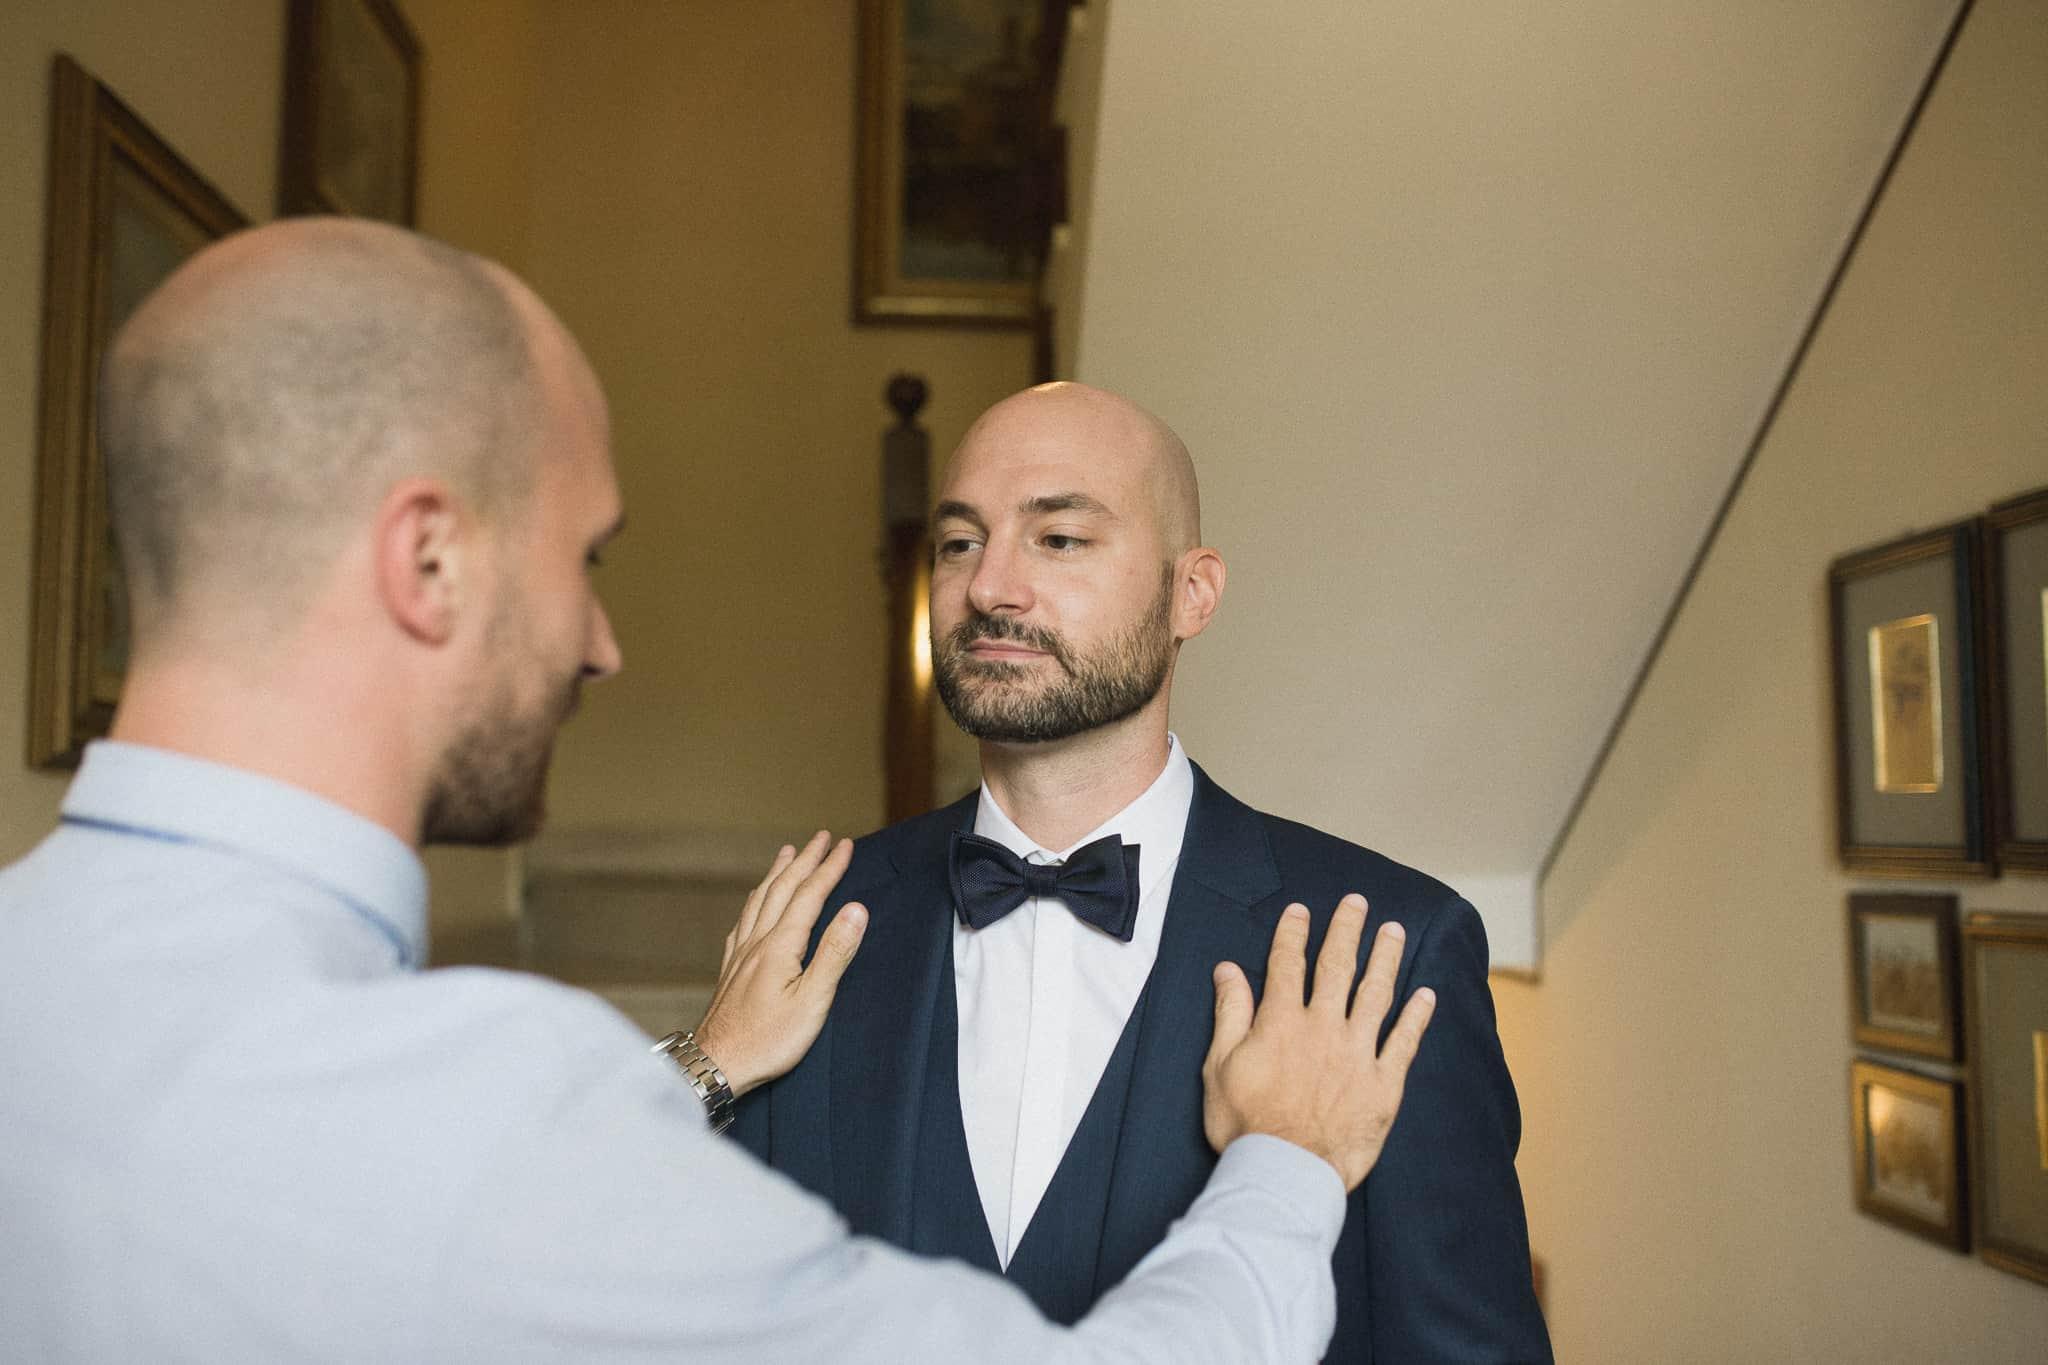 fotografo matrimonio reportage fondo brugarolo 0004